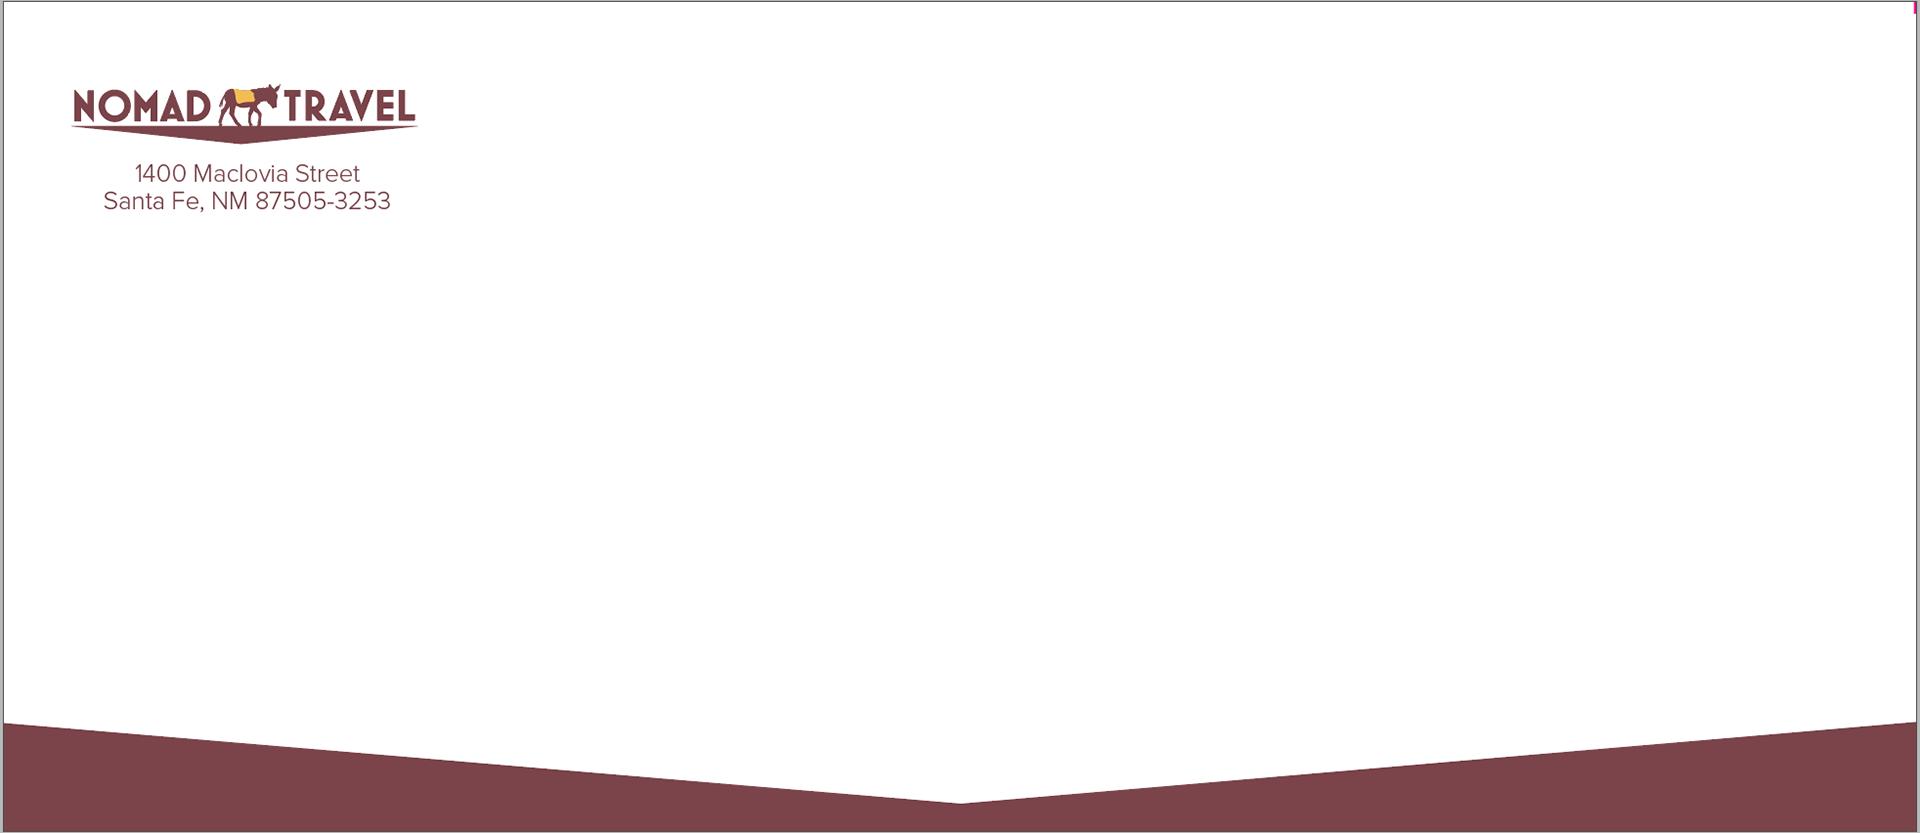 Missy Hilton - Letterhead, Business Card, Envelope